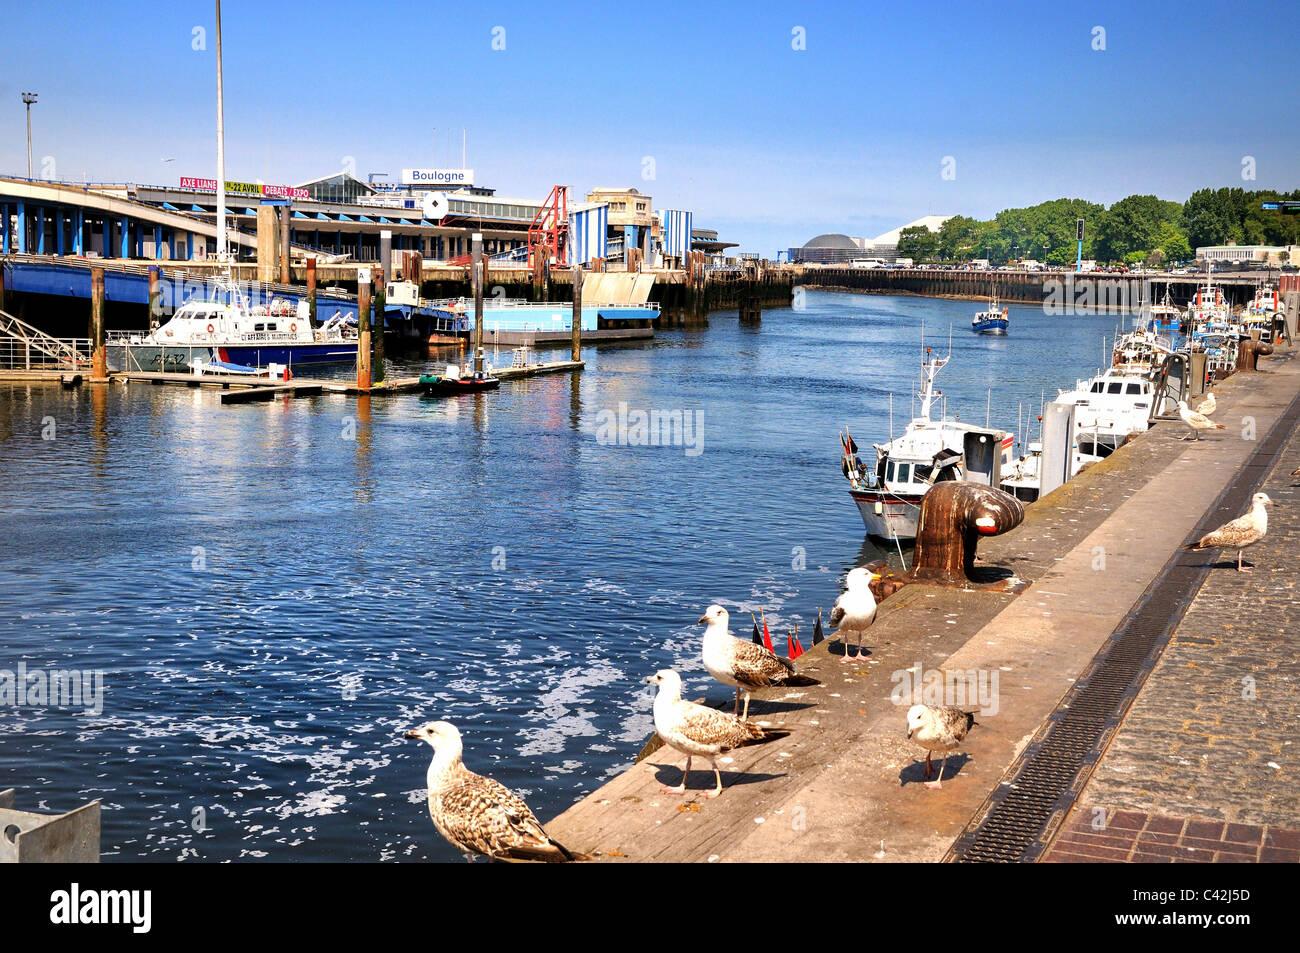 Boulogne sur Mer harbor France - Stock Image